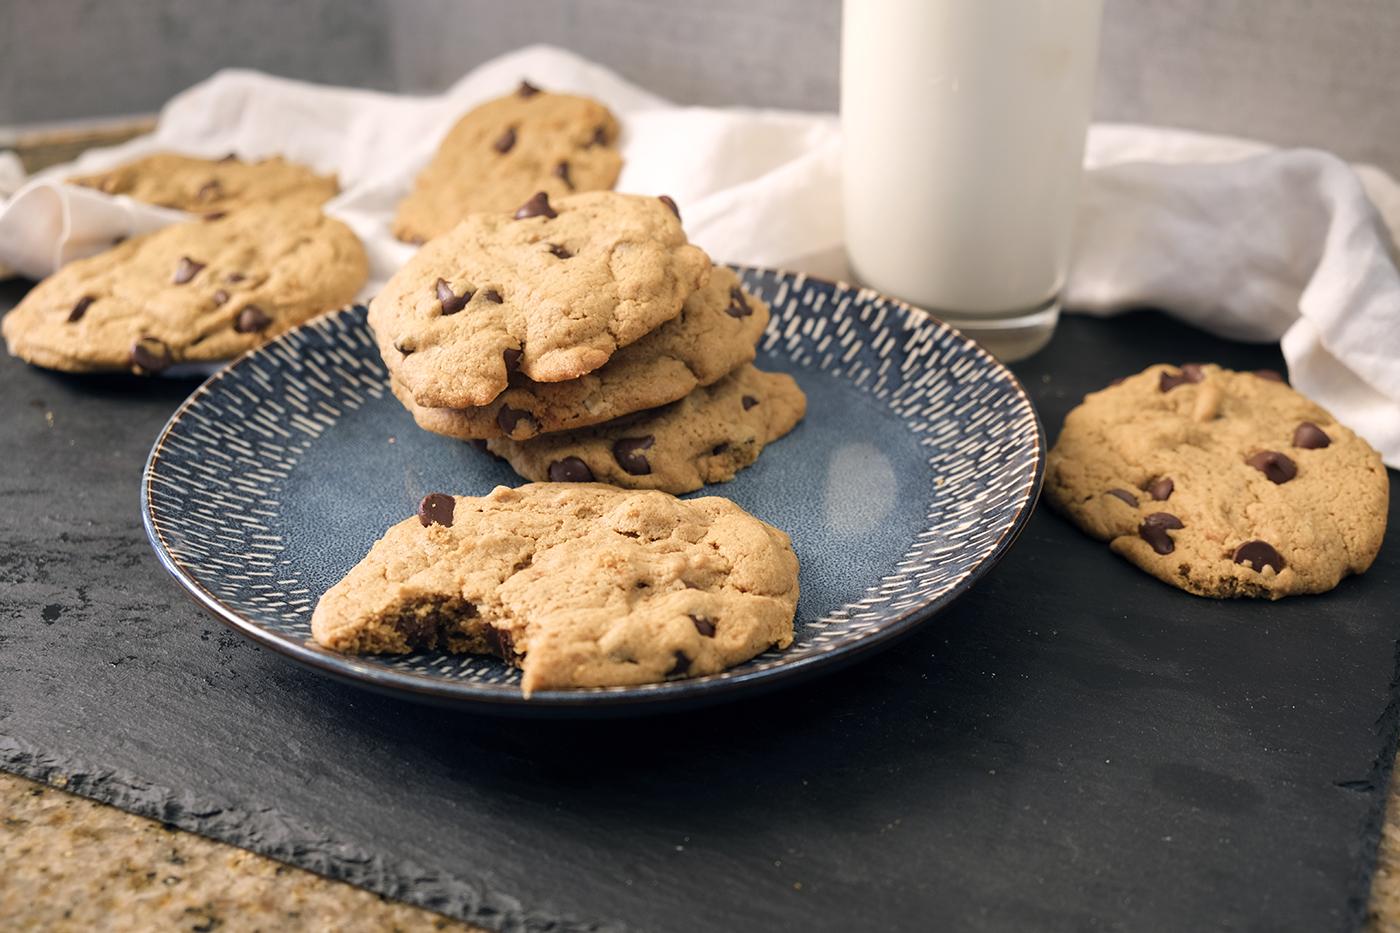 RECIPE: Tahini Chocolate Chip Cookies